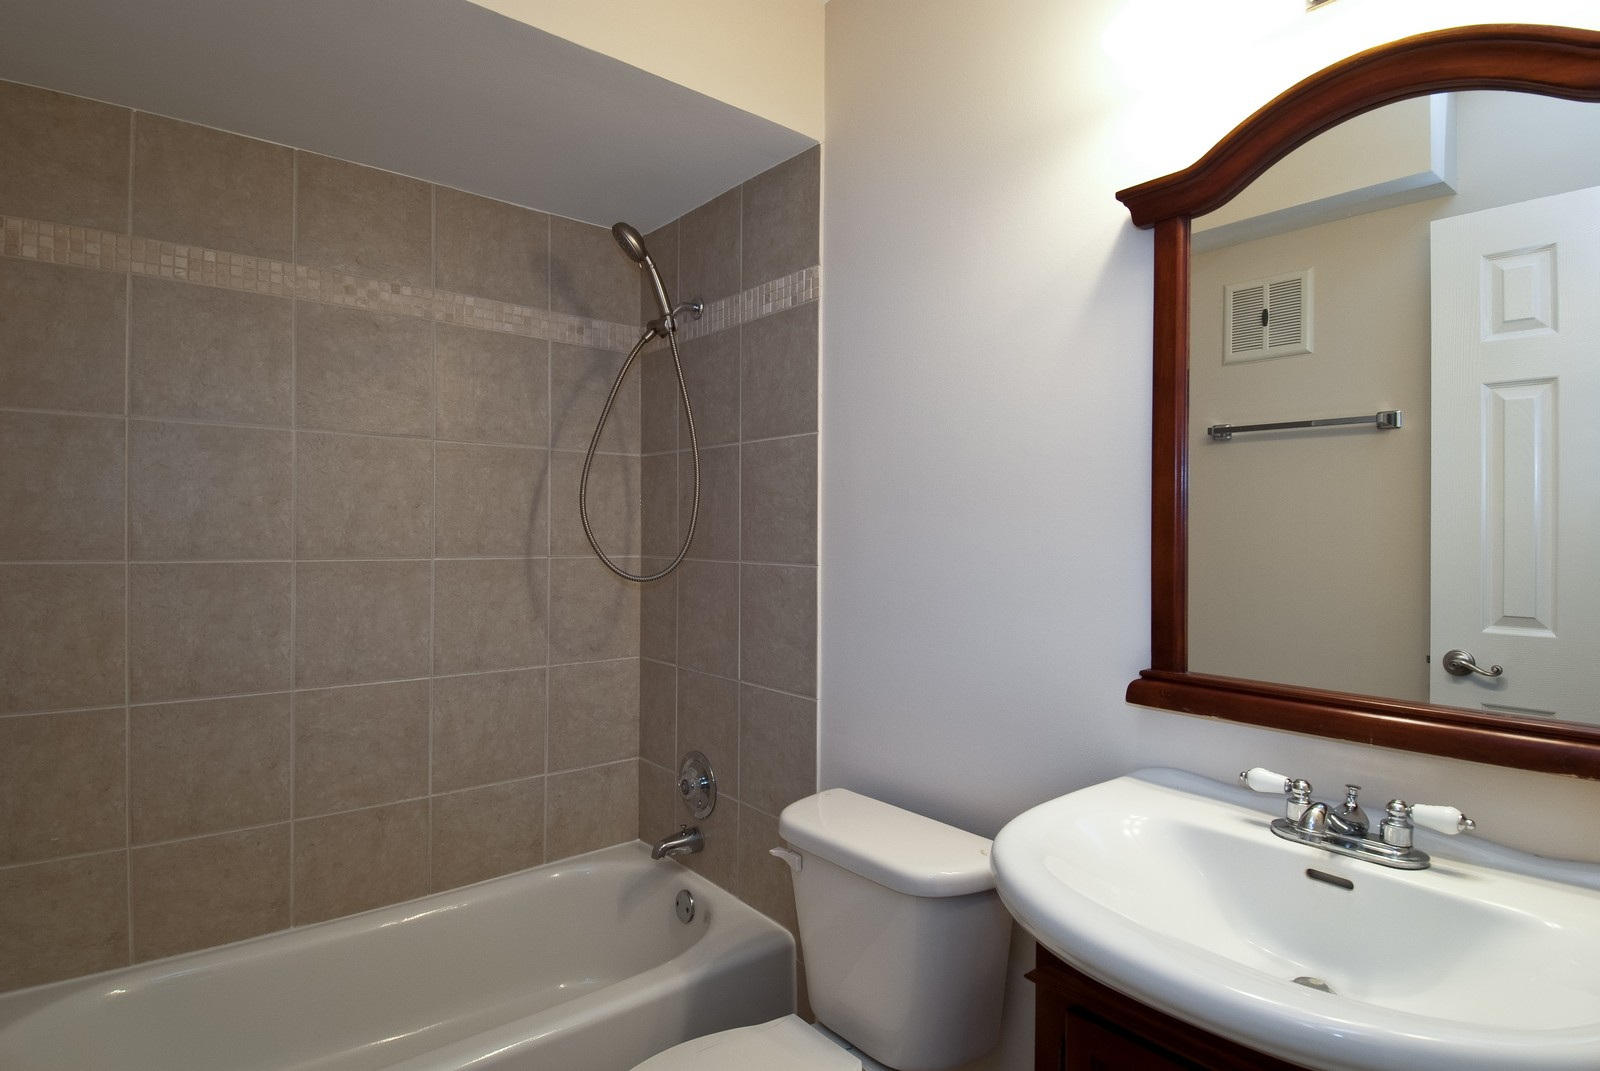 Real Estate Photography - 550 E Main St, Unit 2C, Barrington, IL, 60010 - Bathroom